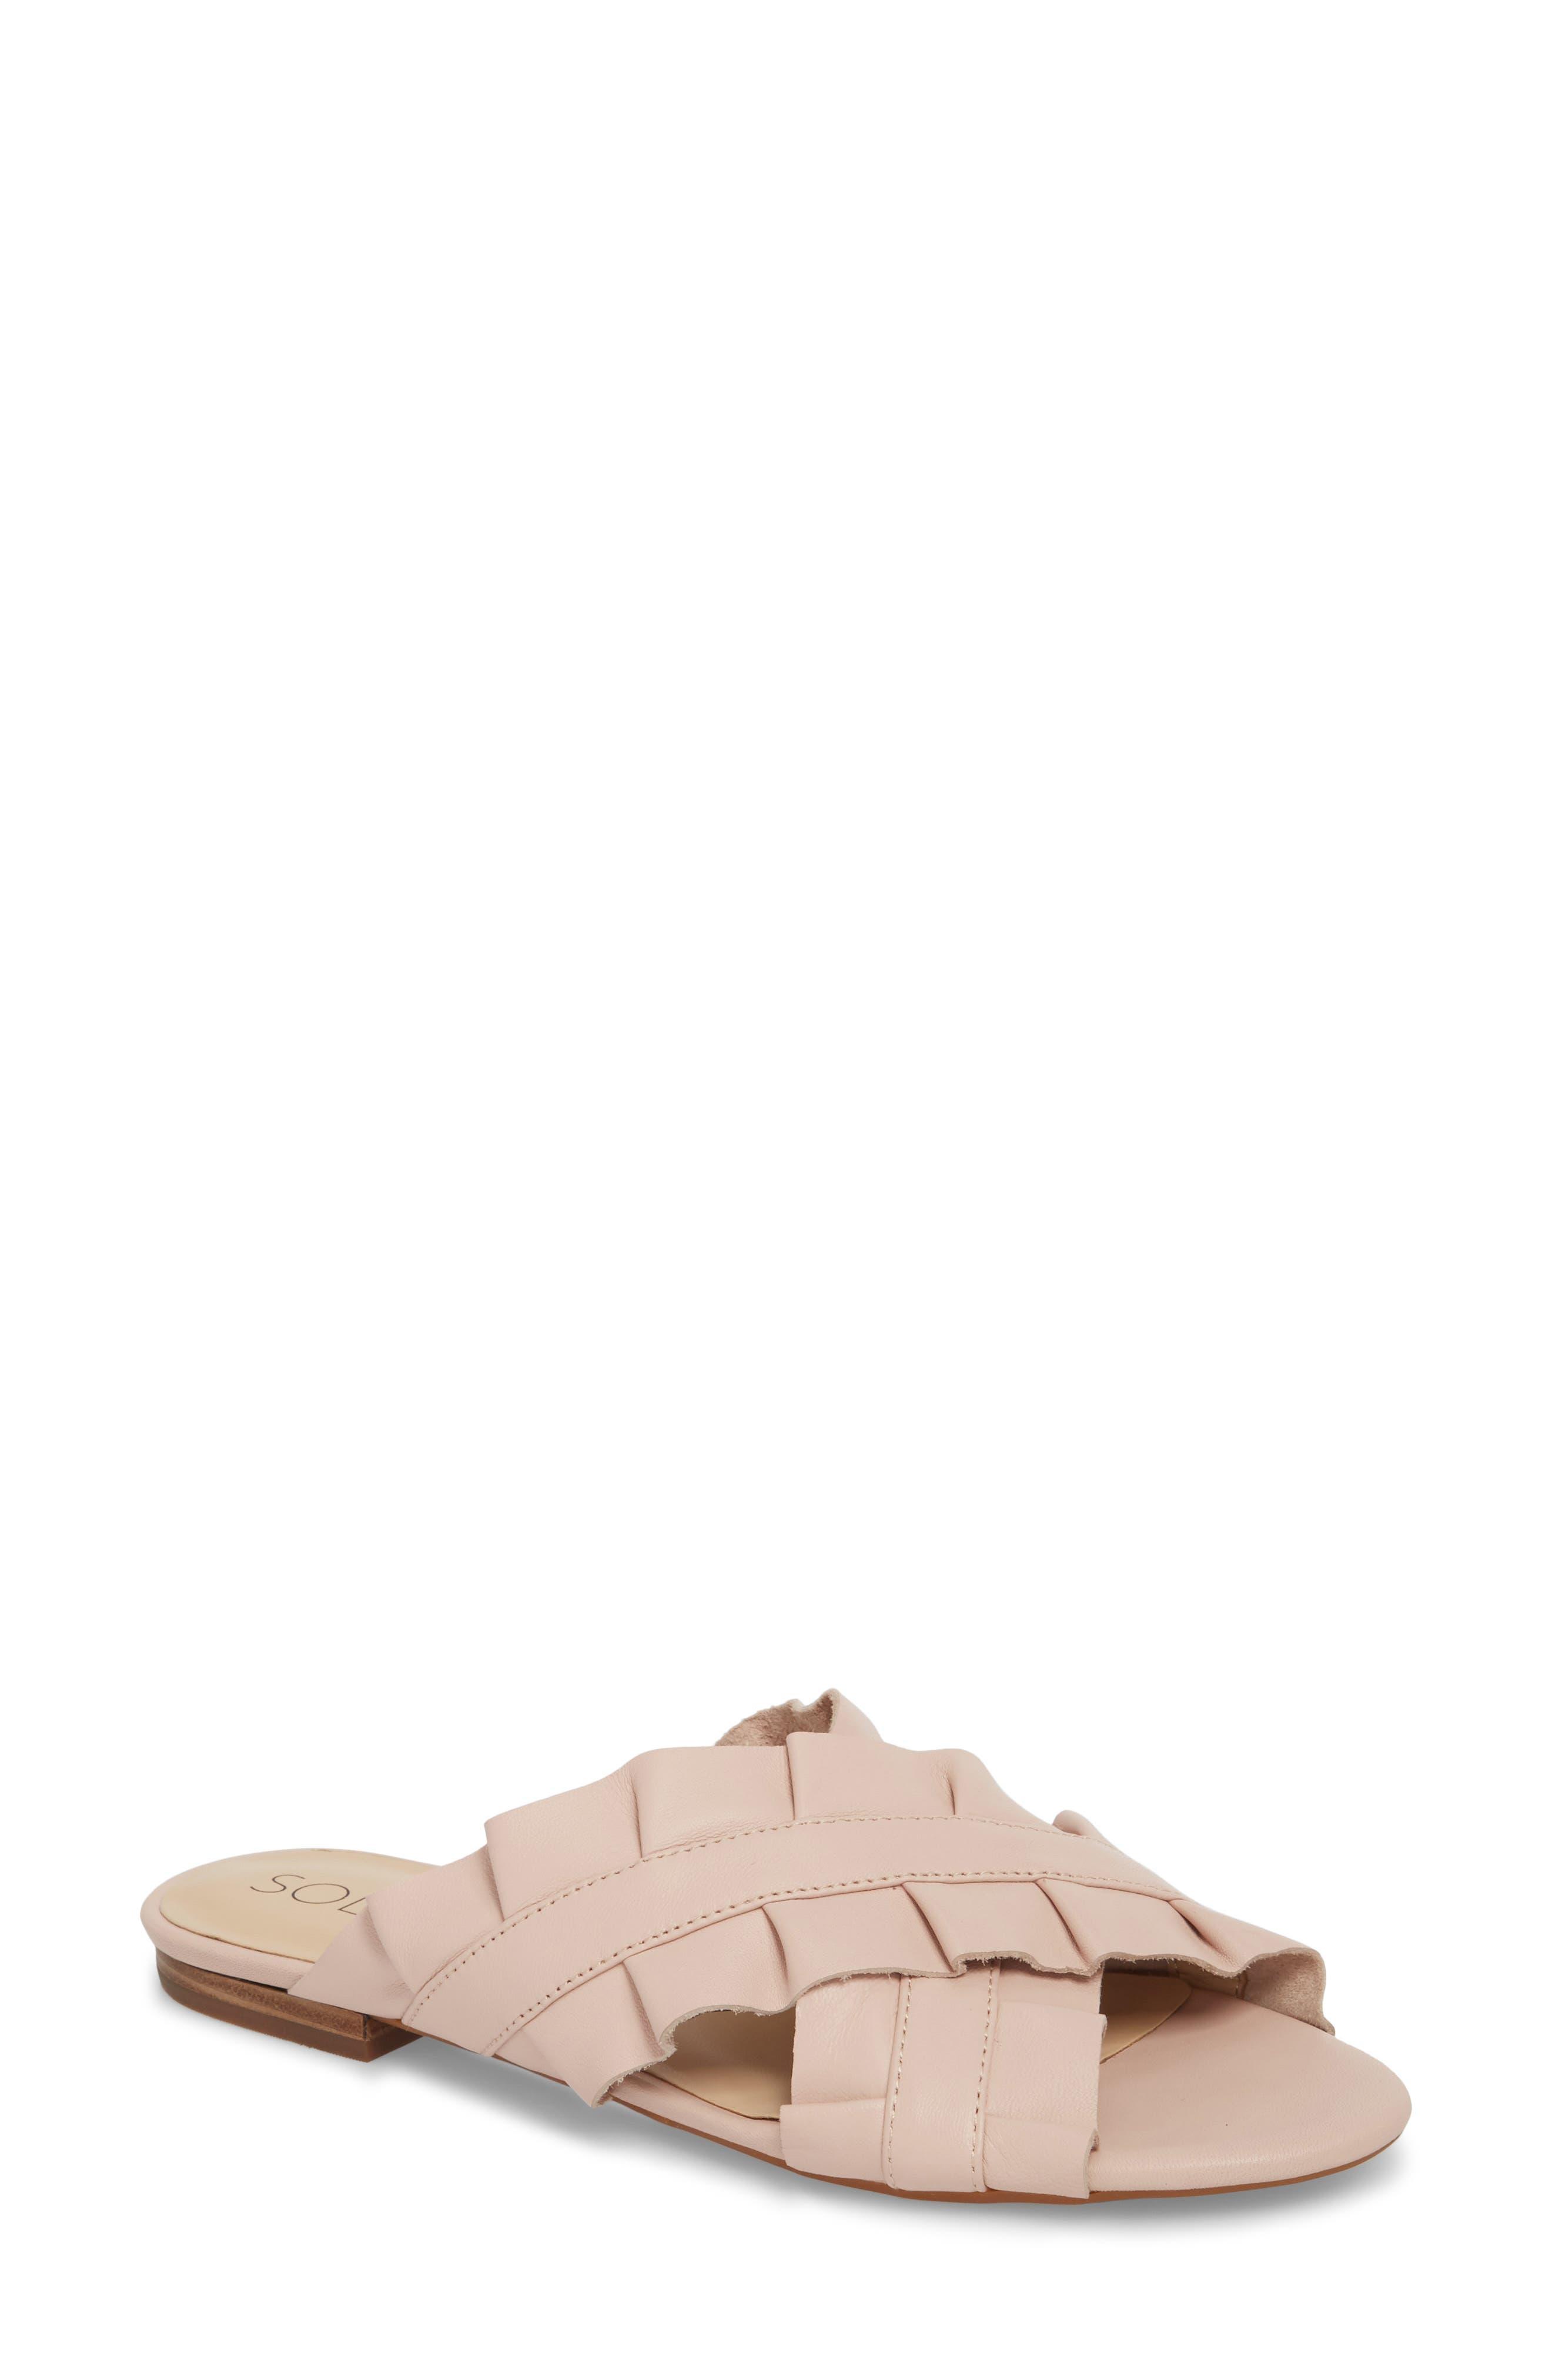 Mandi Slide Sandal,                         Main,                         color, SPRING BLUSH